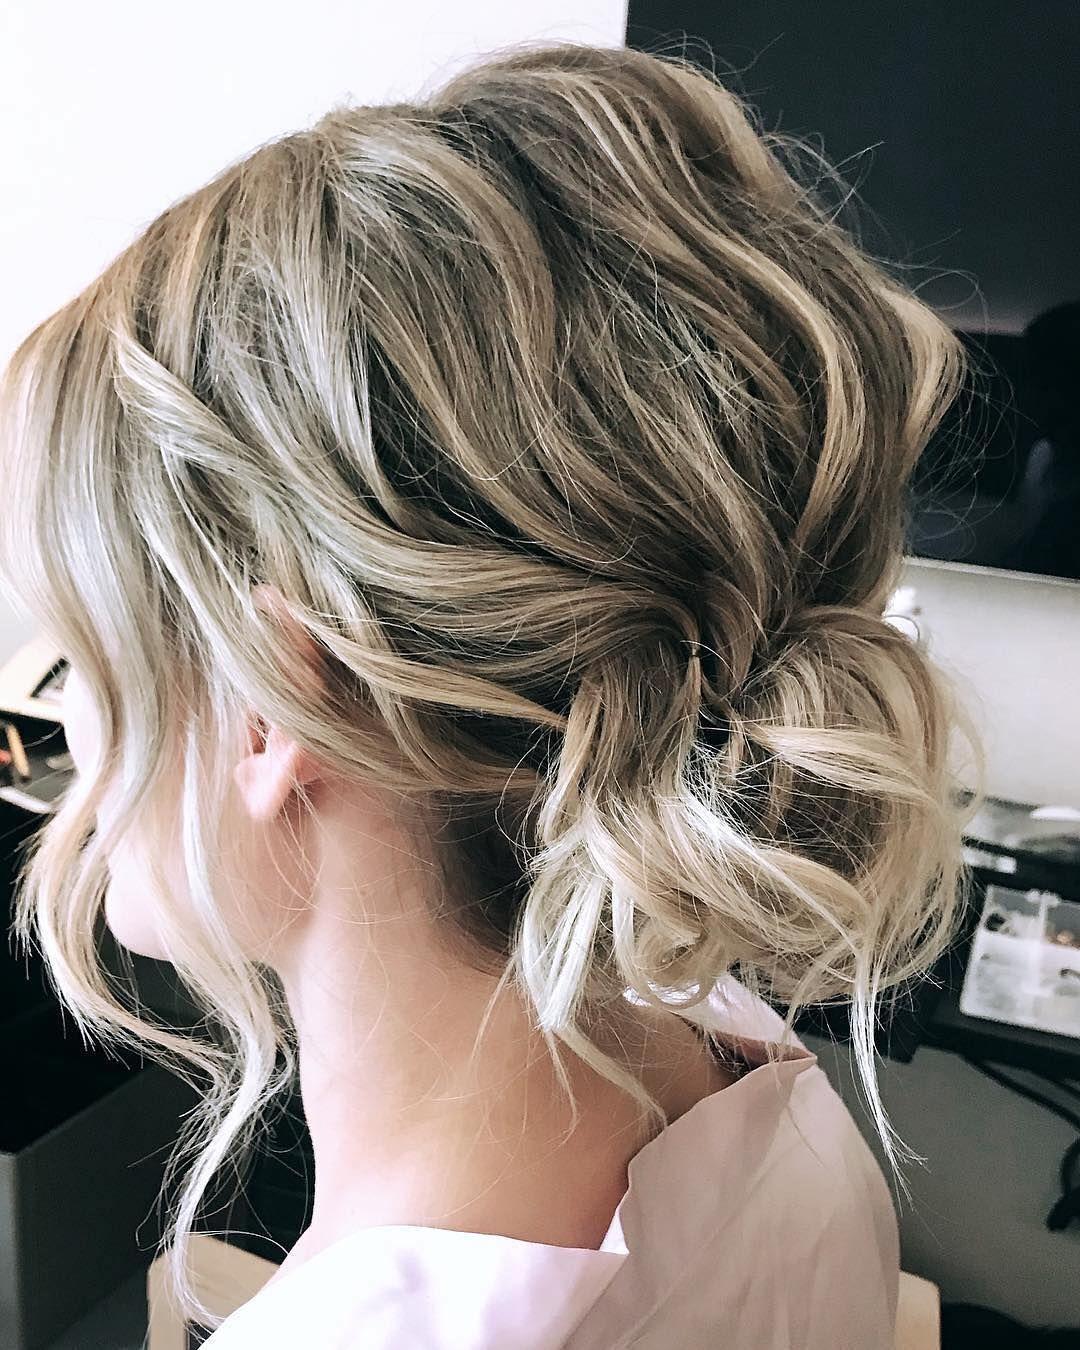 Pin By Birchbox On Hair Up Do S Medium Length Hair Styles Short Wedding Hair Updos For Medium Length Hair